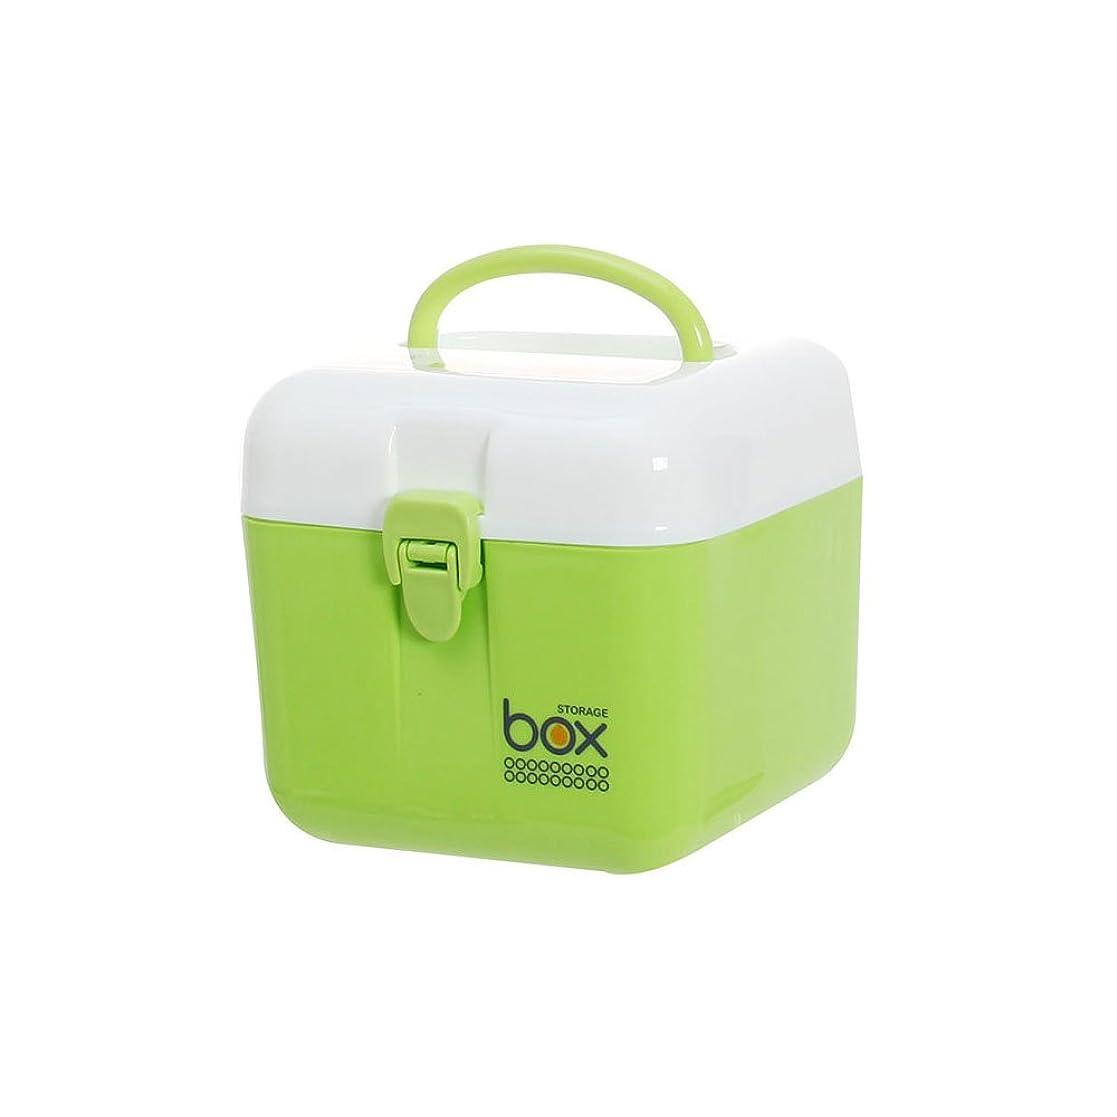 Bartram 救急箱 薬箱 収納ケース 家用薬収納ケース 子供の薬の収納ボックス 応急処置 2段 軽量/安全/携帯性高い 16*16*15